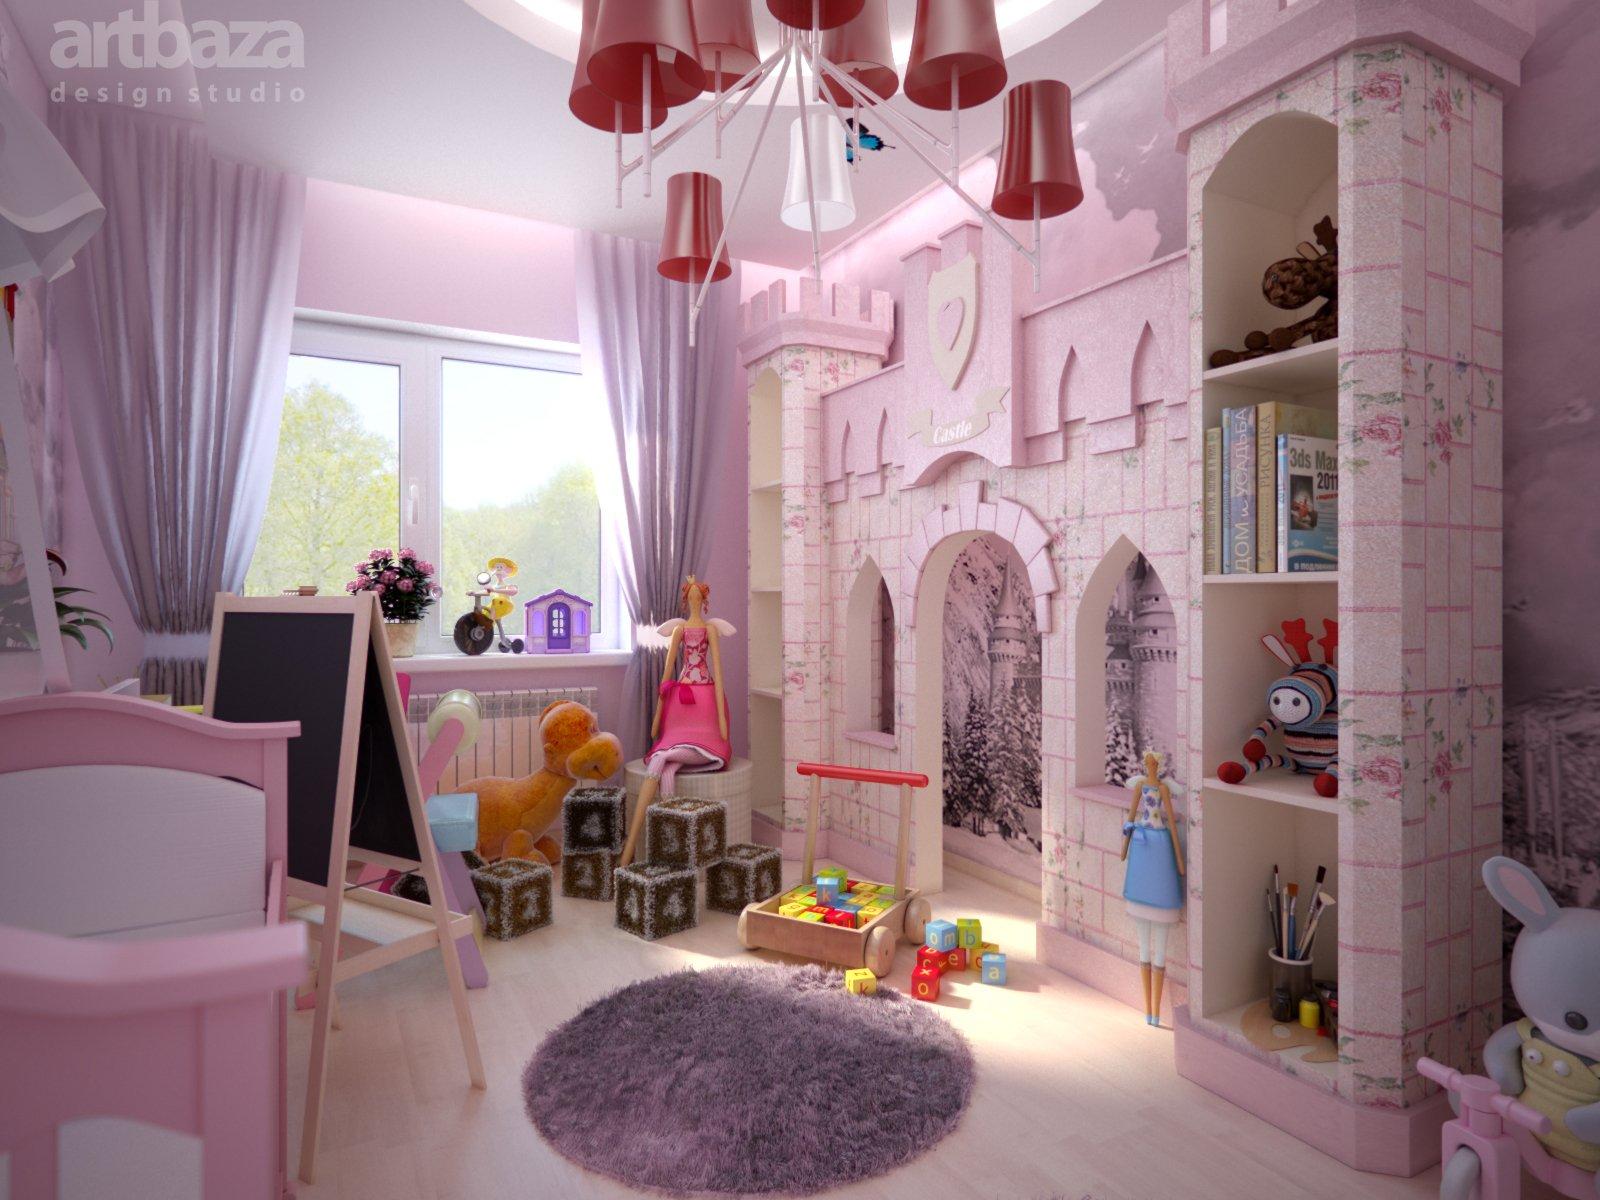 Дизайн комнаты для двух девочек | Блог о дизайне интерьера ...: http://www.v-interere.ru/detskaya-komnata/dizajn-komnaty-dlya-dvux-devochek.html